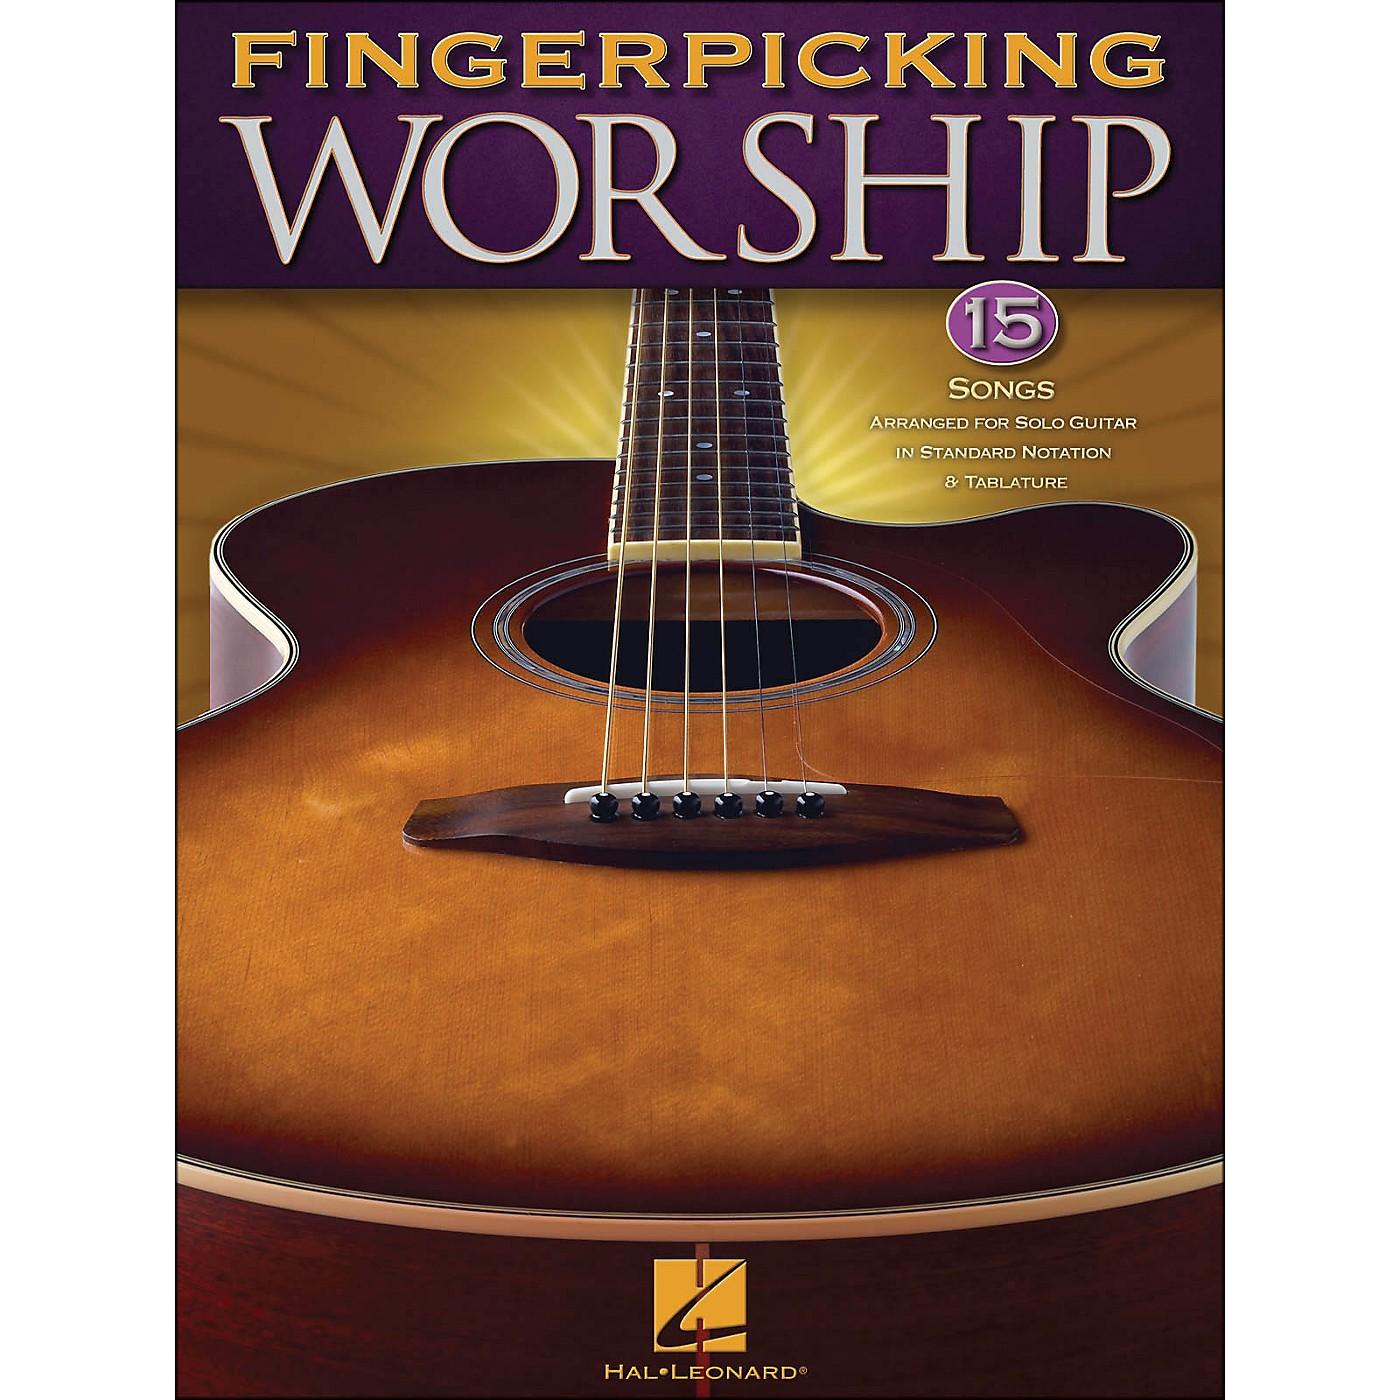 Hal Leonard Fingerpicking Worship 15 So Ngs Arranged for Solo Guitar In Standard Notation & Tab thumbnail